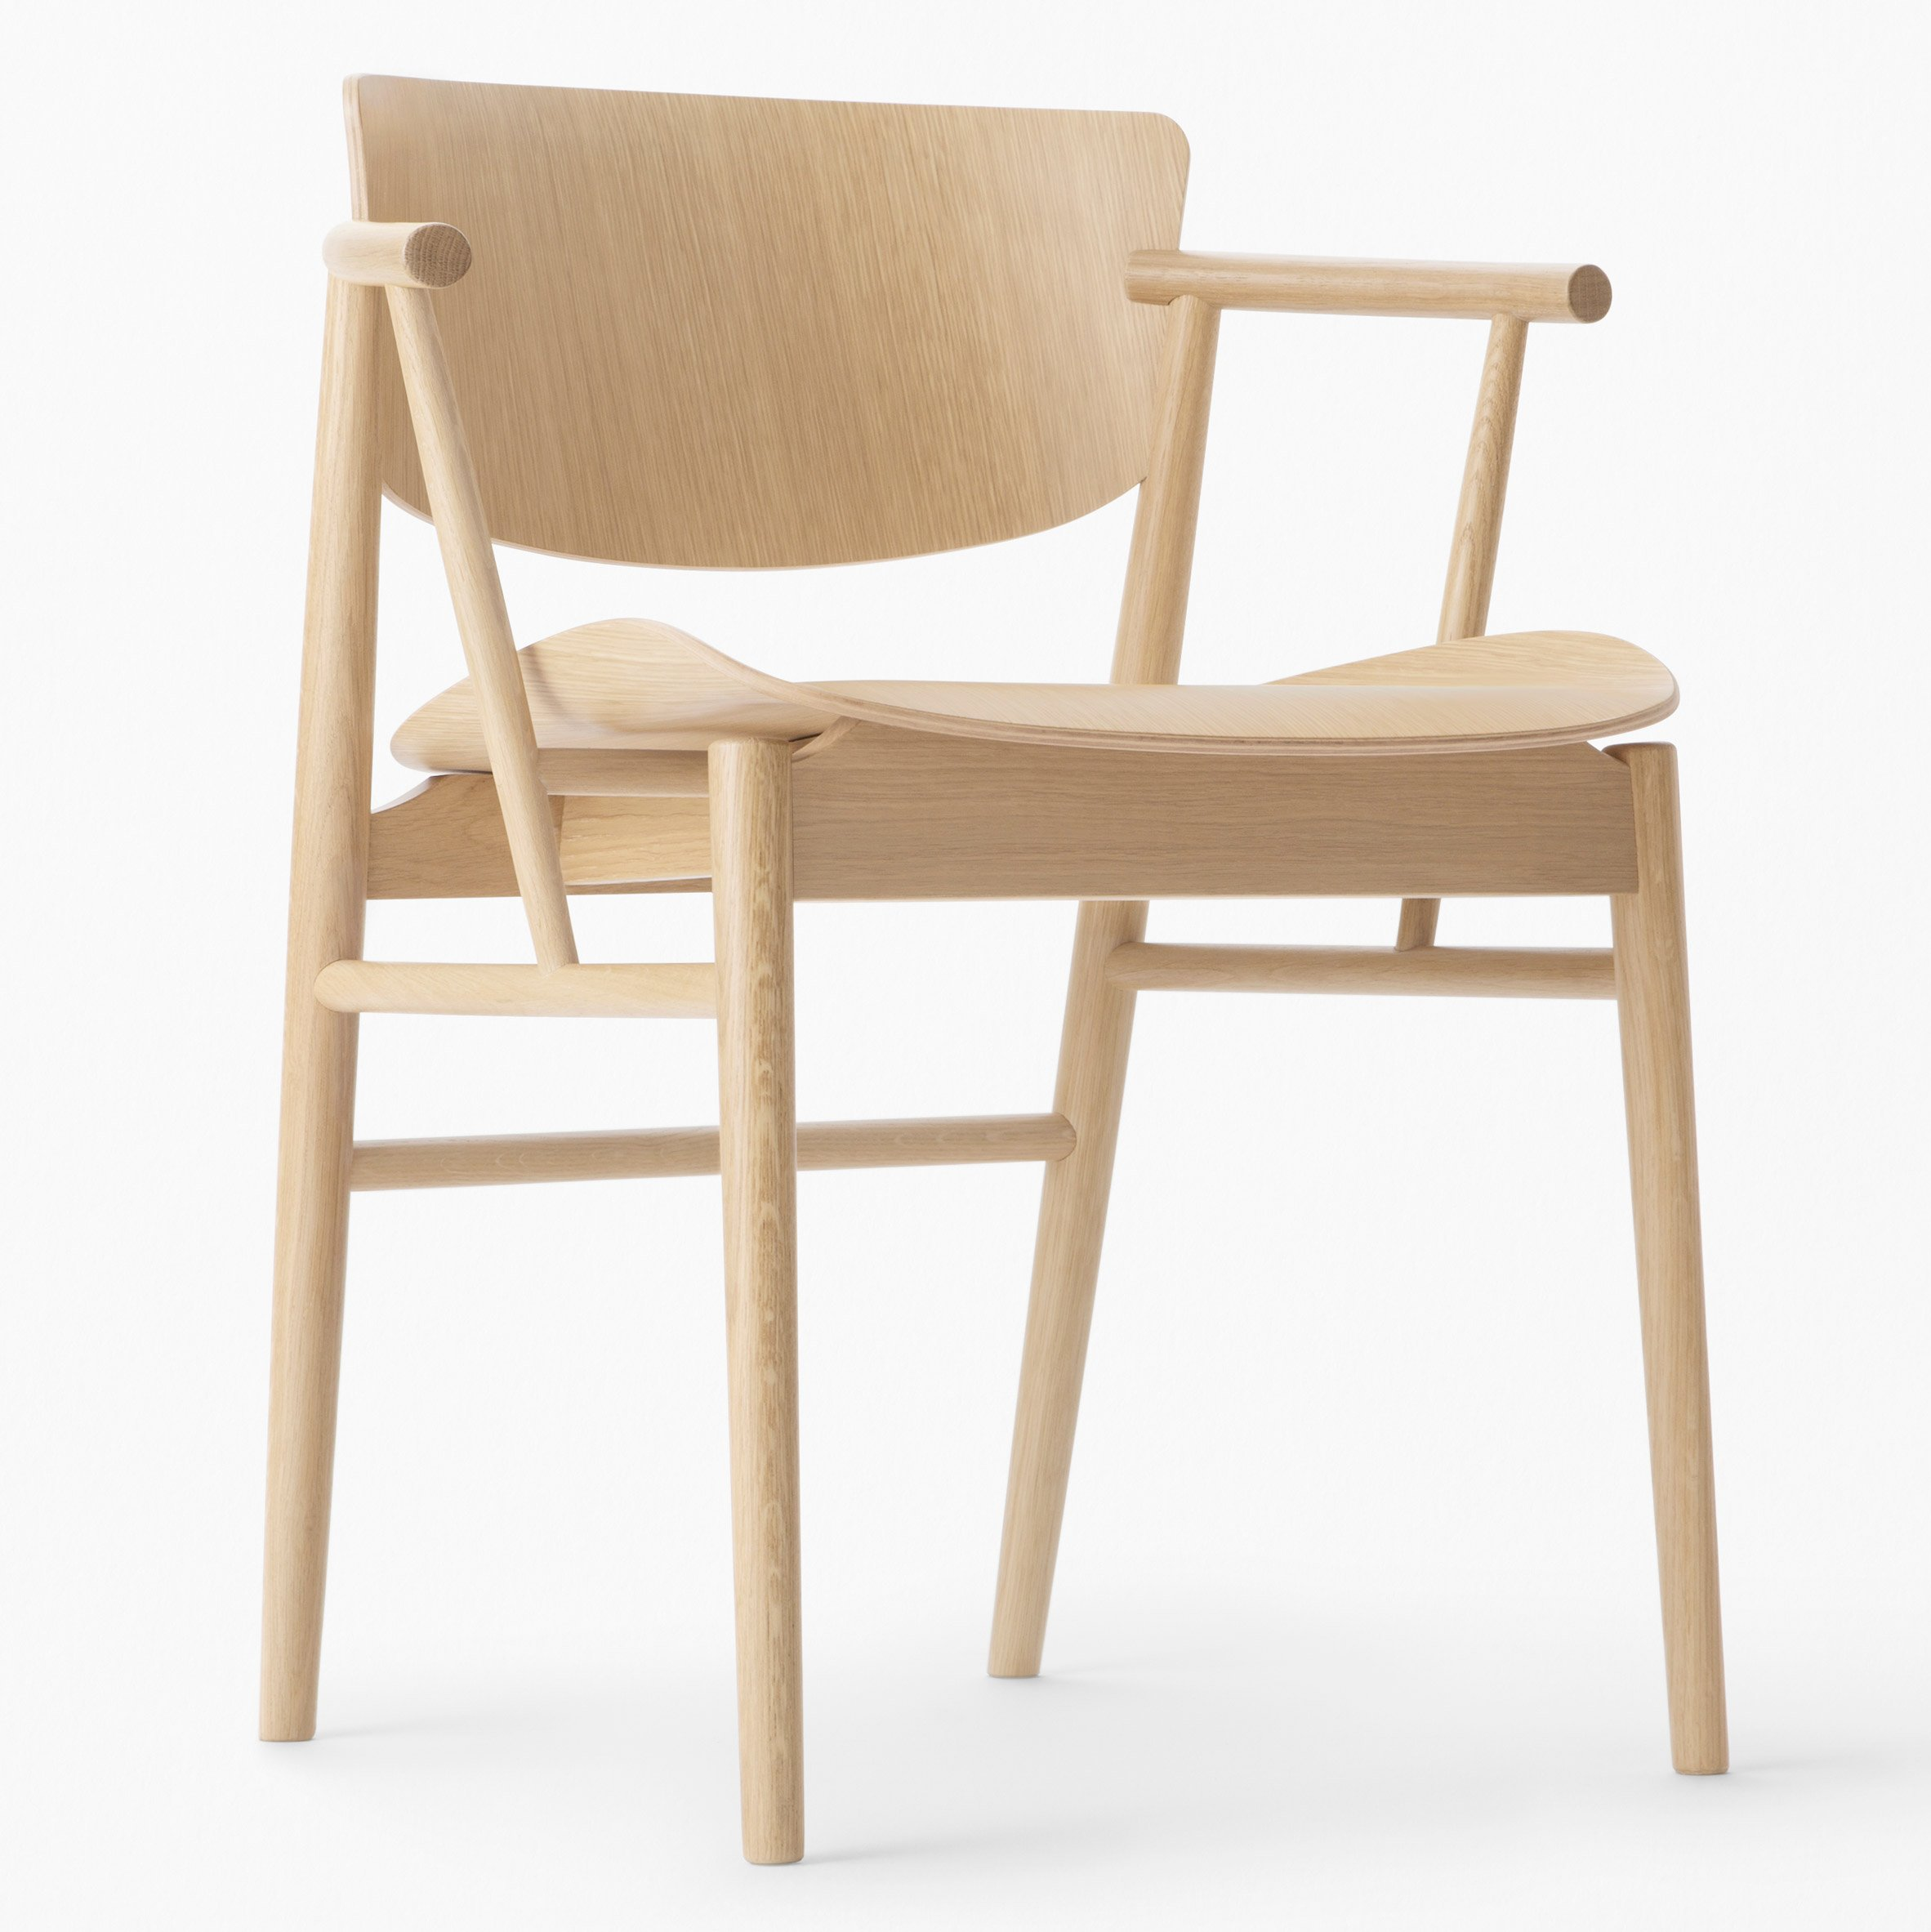 Nendo Designs First Entirely Wooden Chair For Fritz Hansen In 61 Years